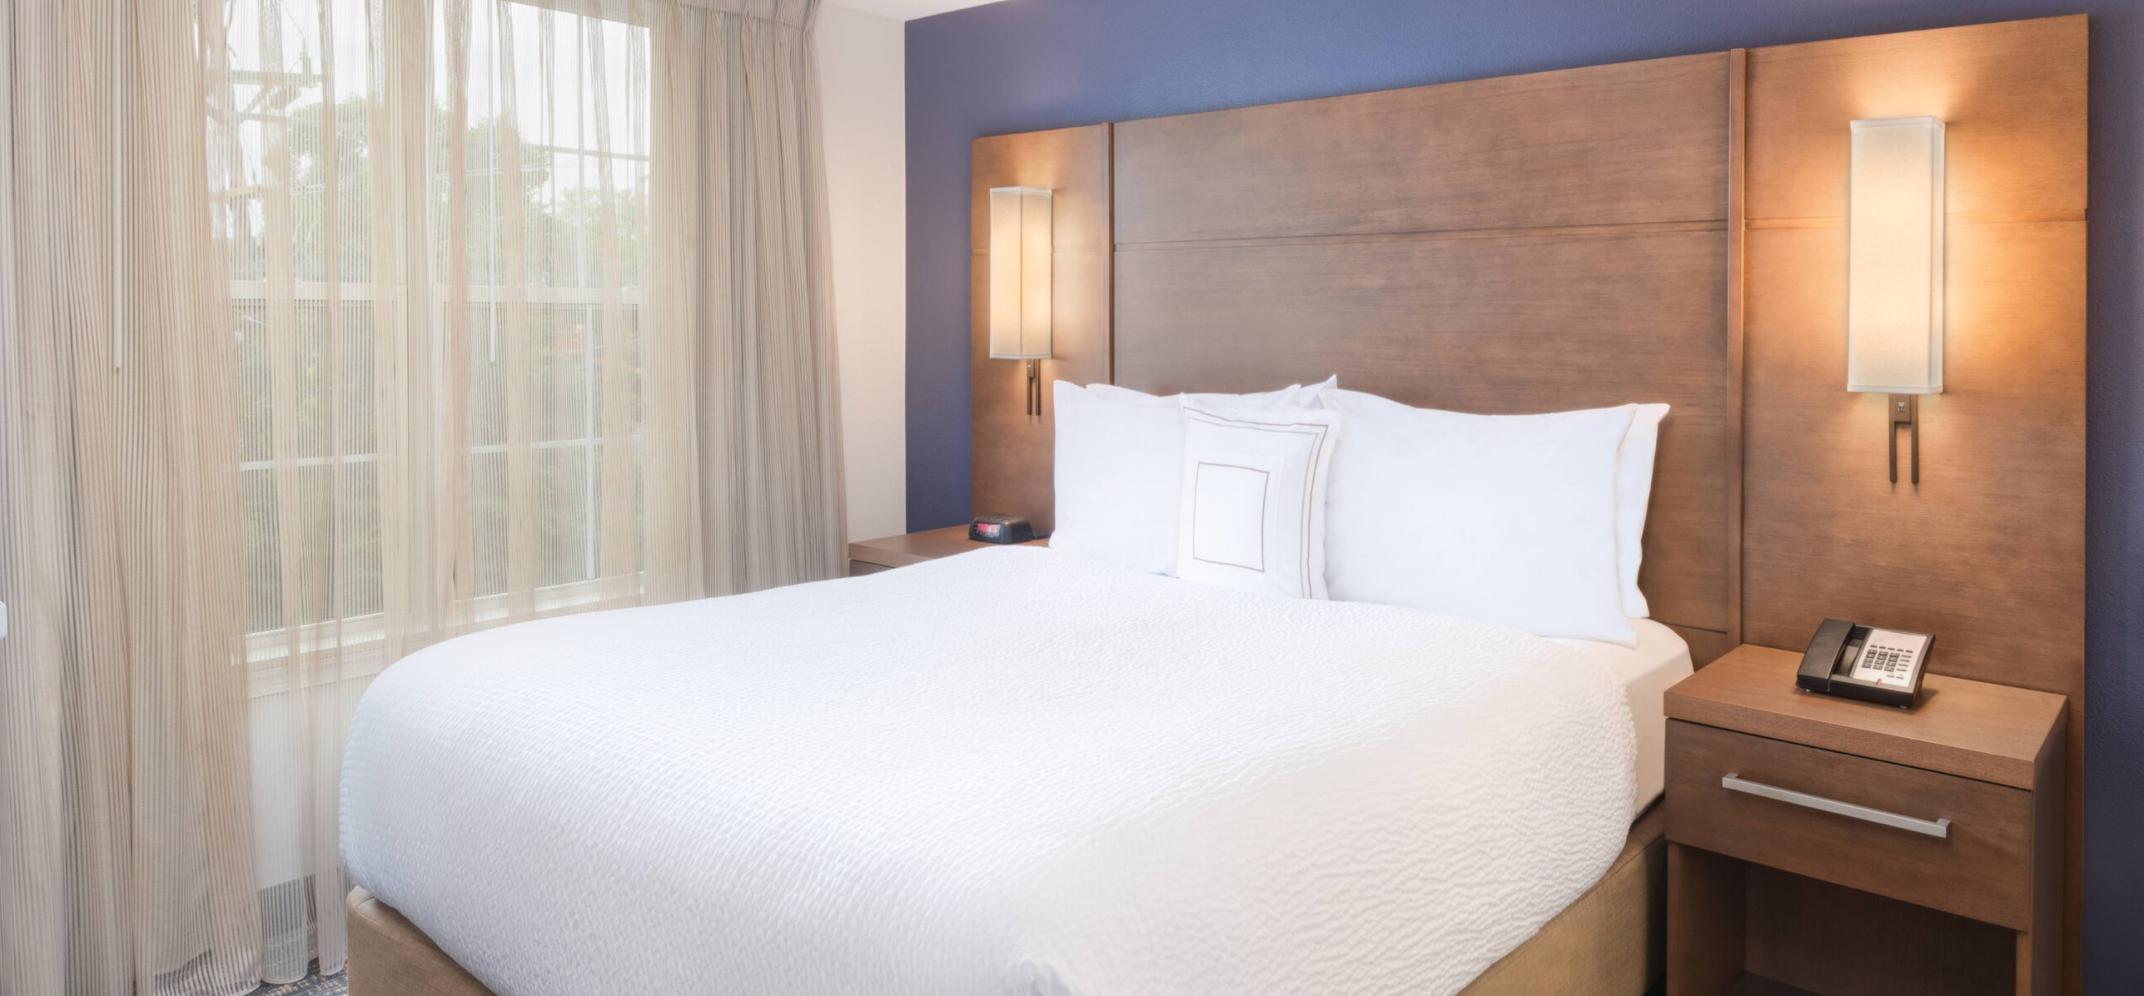 https://www.hotelsbyday.com/_data/default-hotel_image/3/18043/screenshot-2020-06-10-at-6-28-46-pm.png